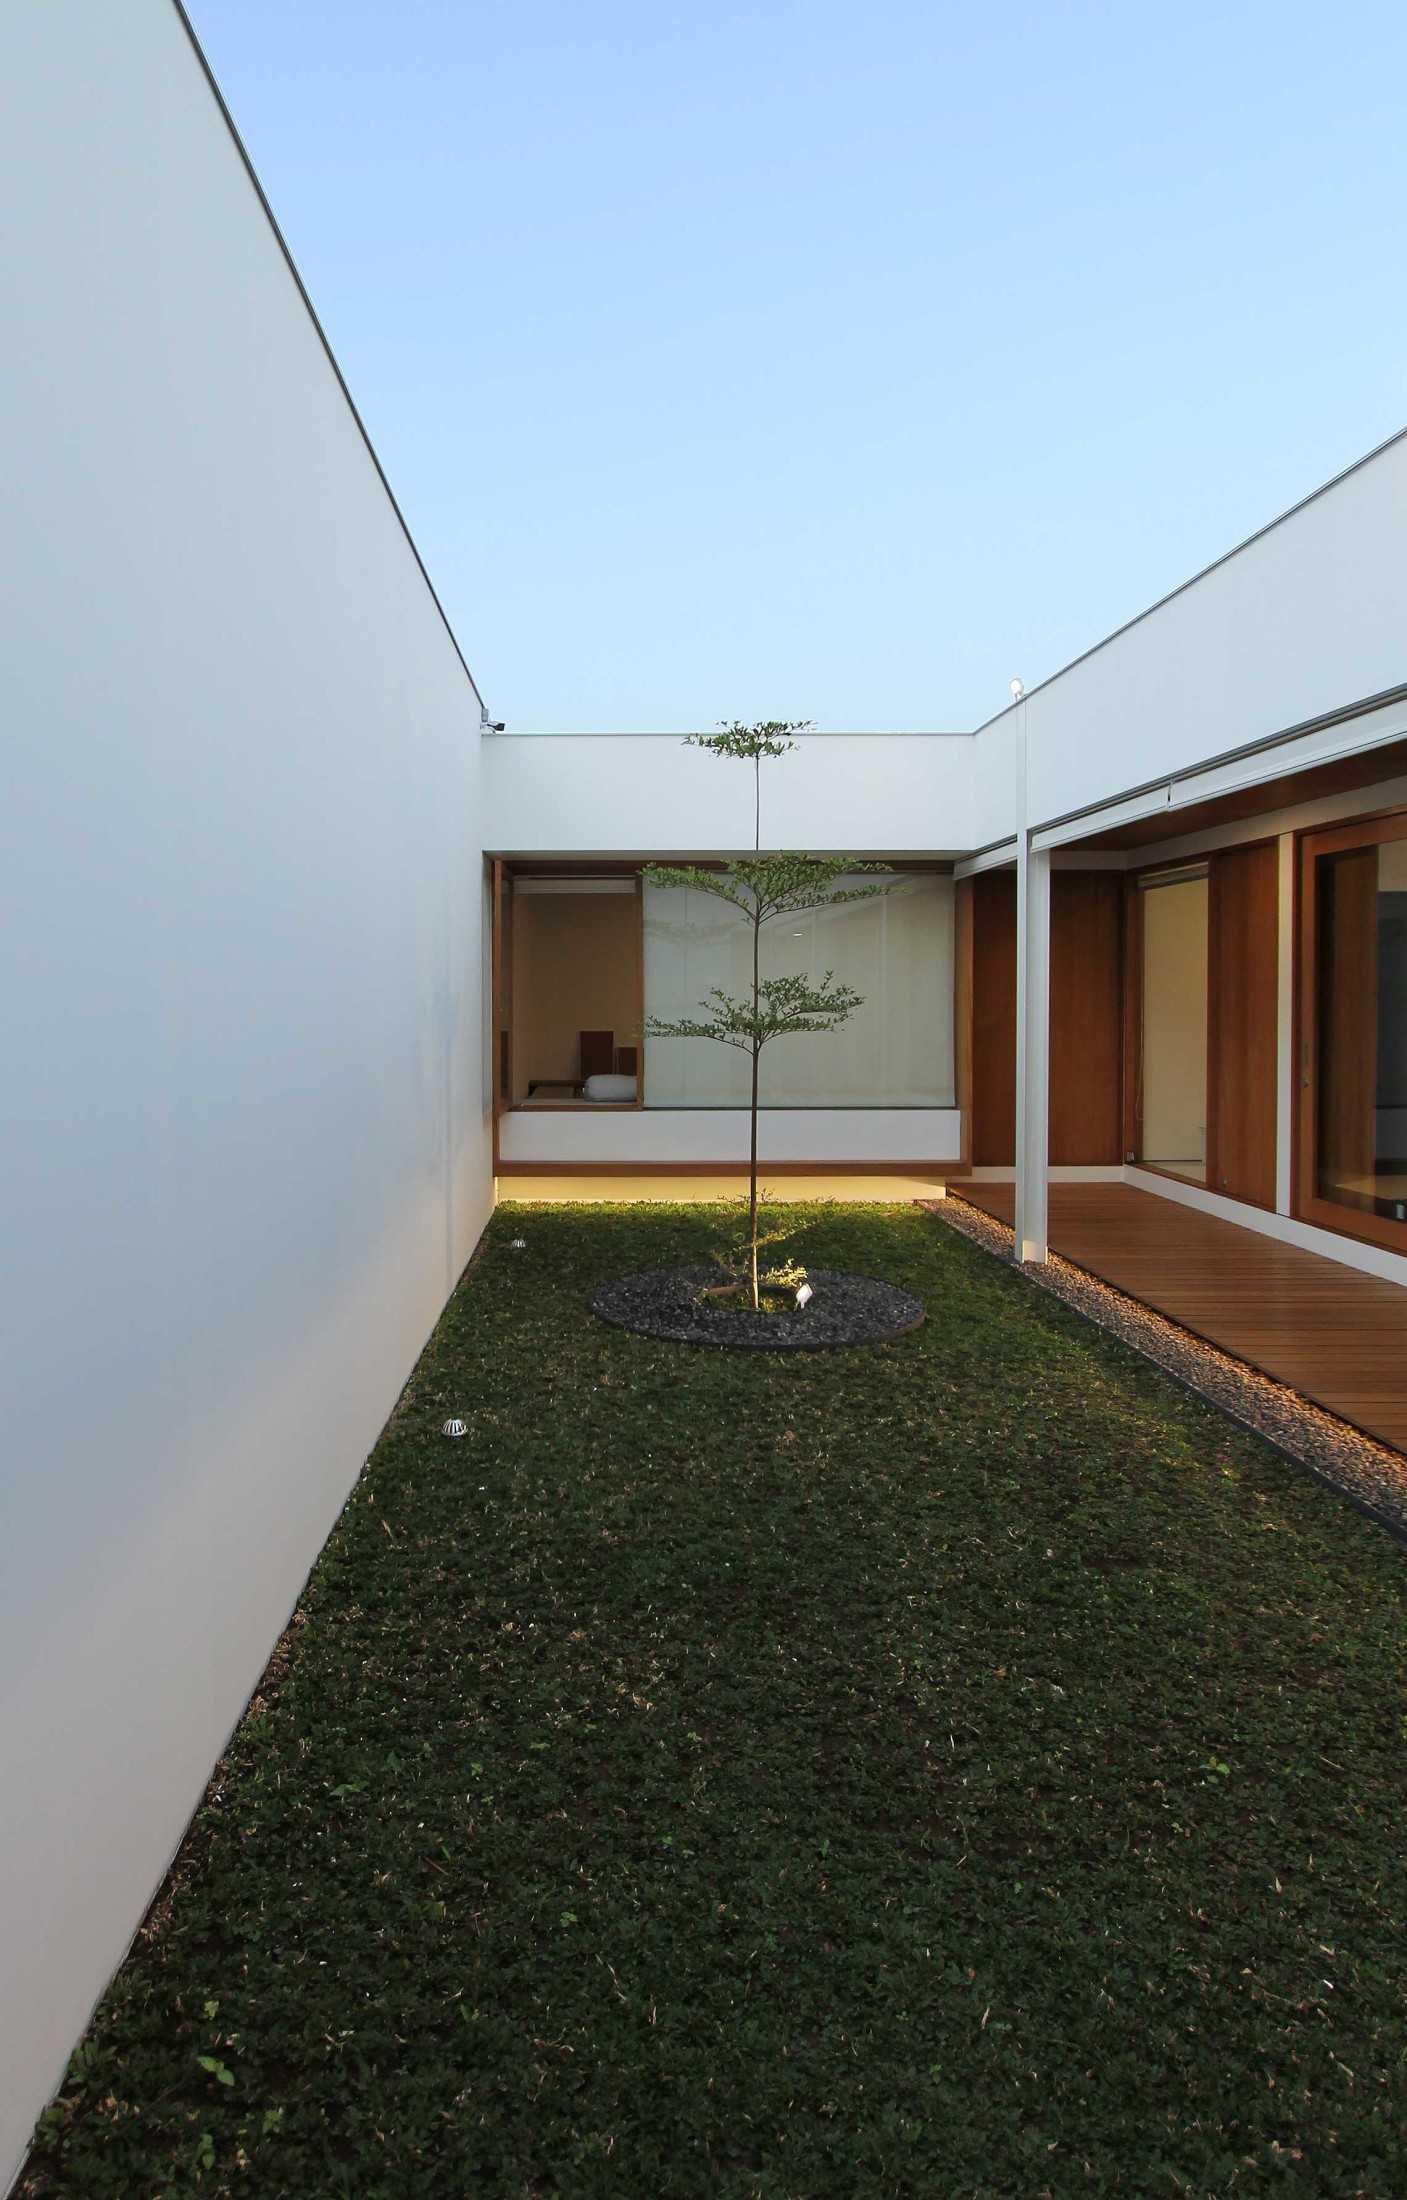 Sasmita Design Studio Penguin House Bandung, Kota Bandung, Jawa Barat, Indonesia Bandung, Kota Bandung, Jawa Barat, Indonesia William-Sasmita-Penguin-House  91202